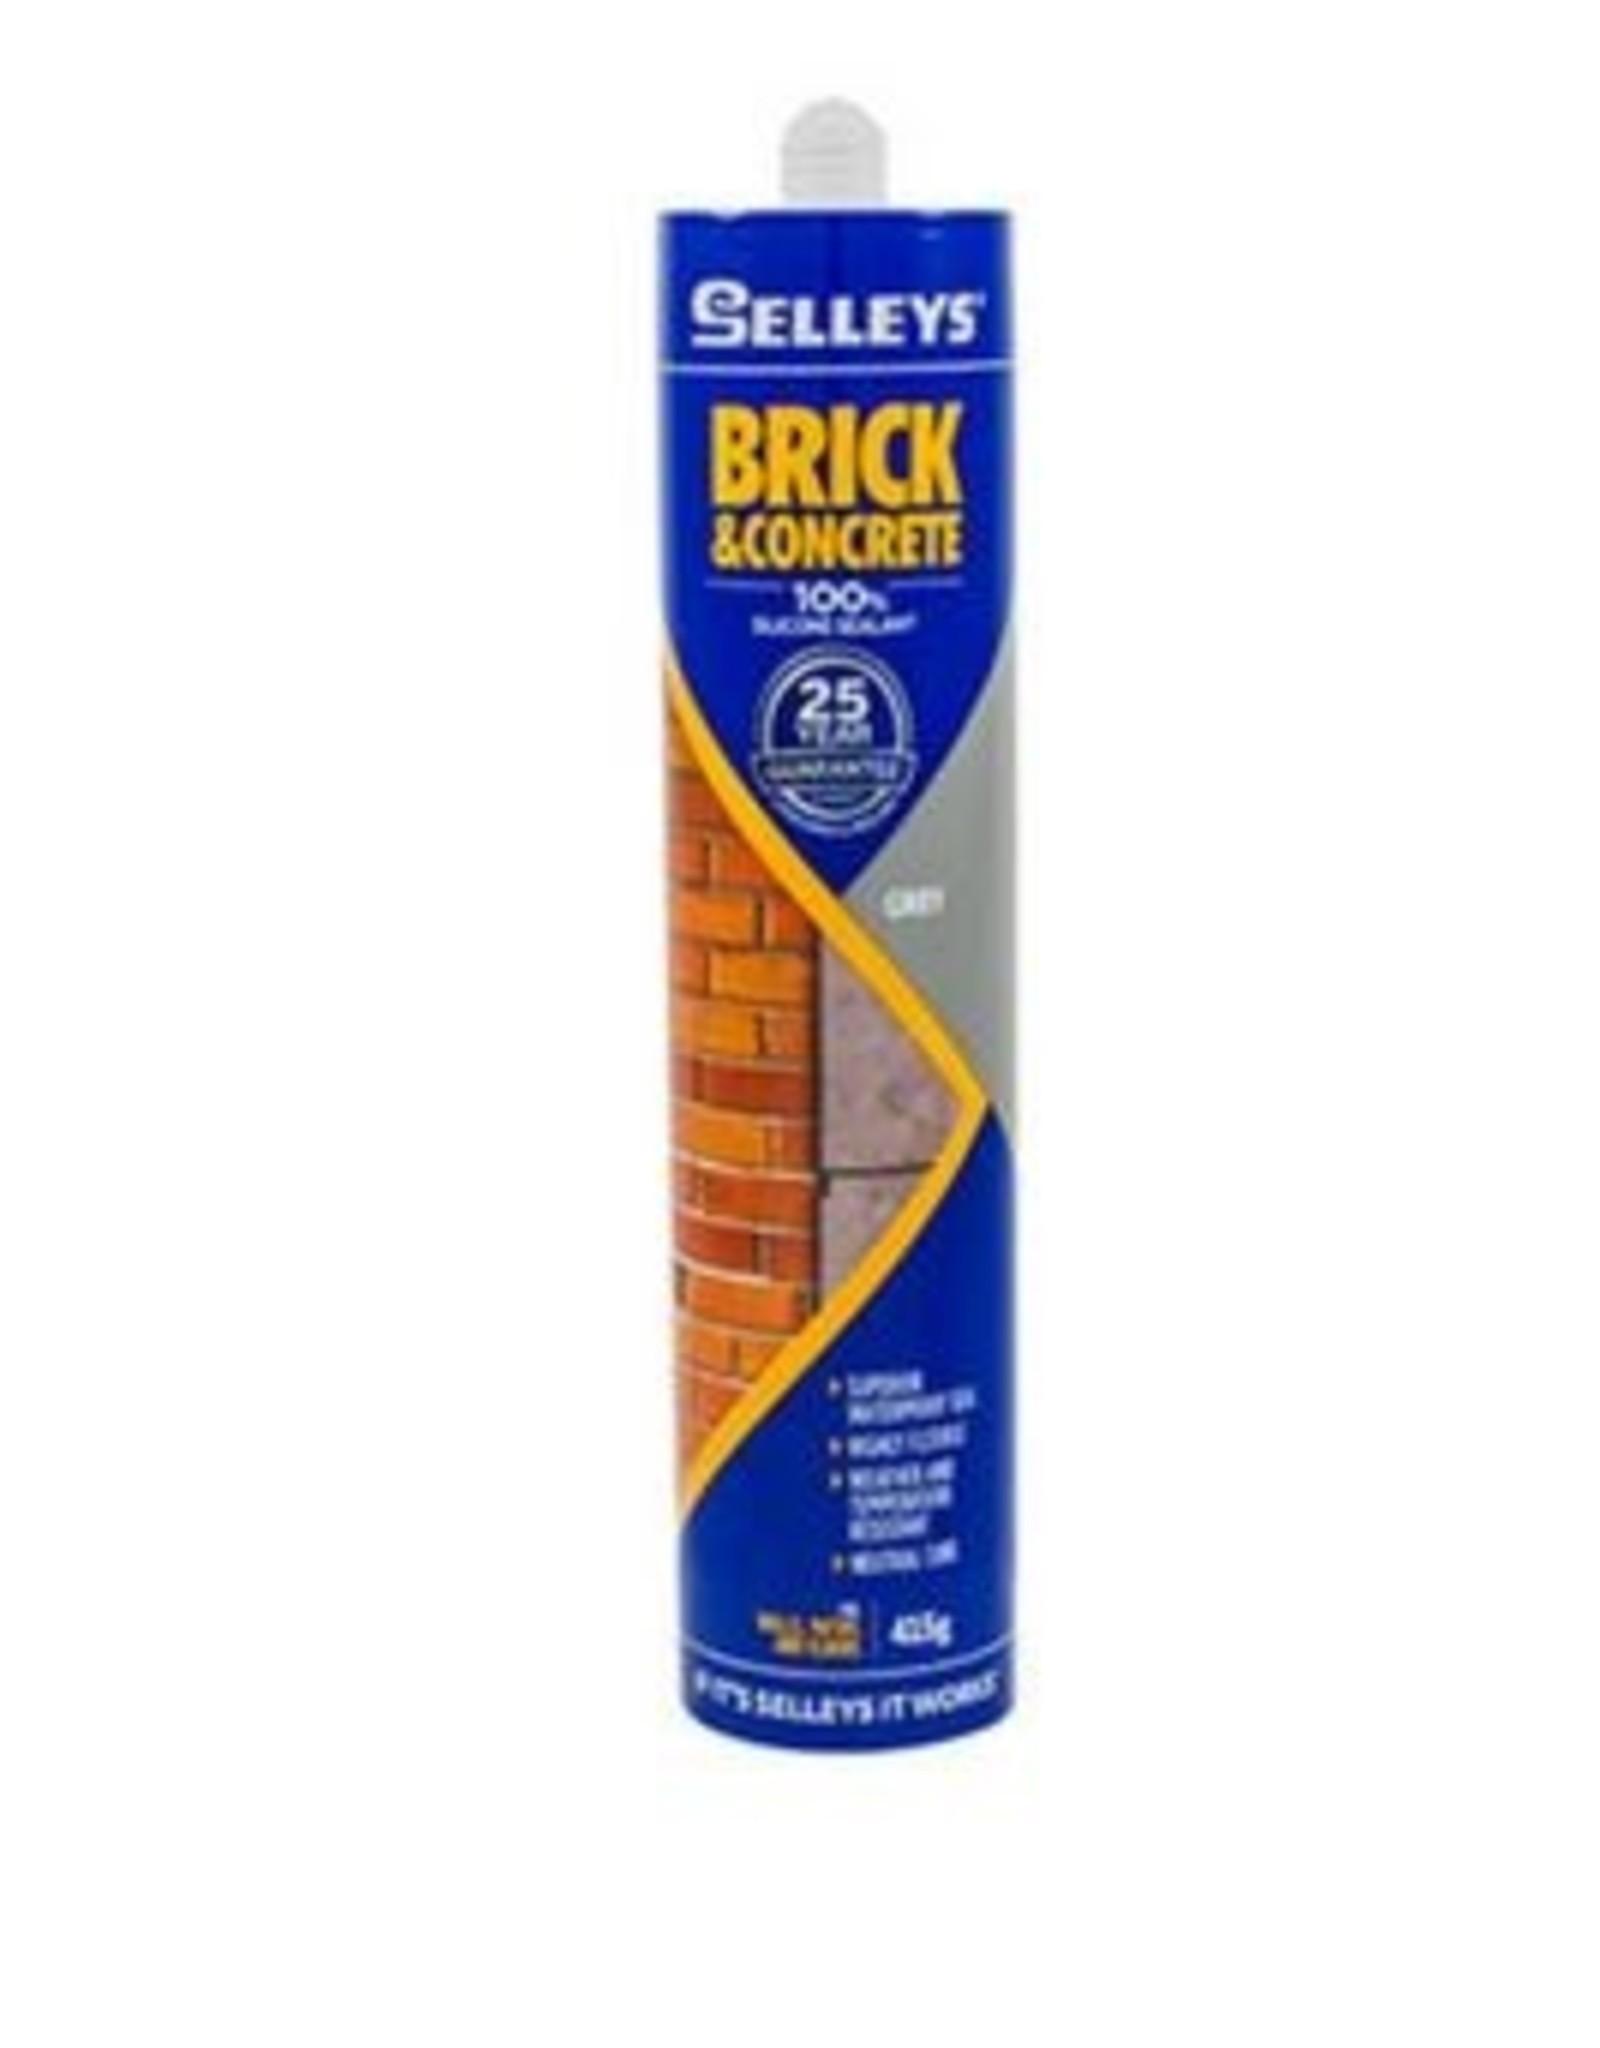 Selley's Brick & Concrete 415gr